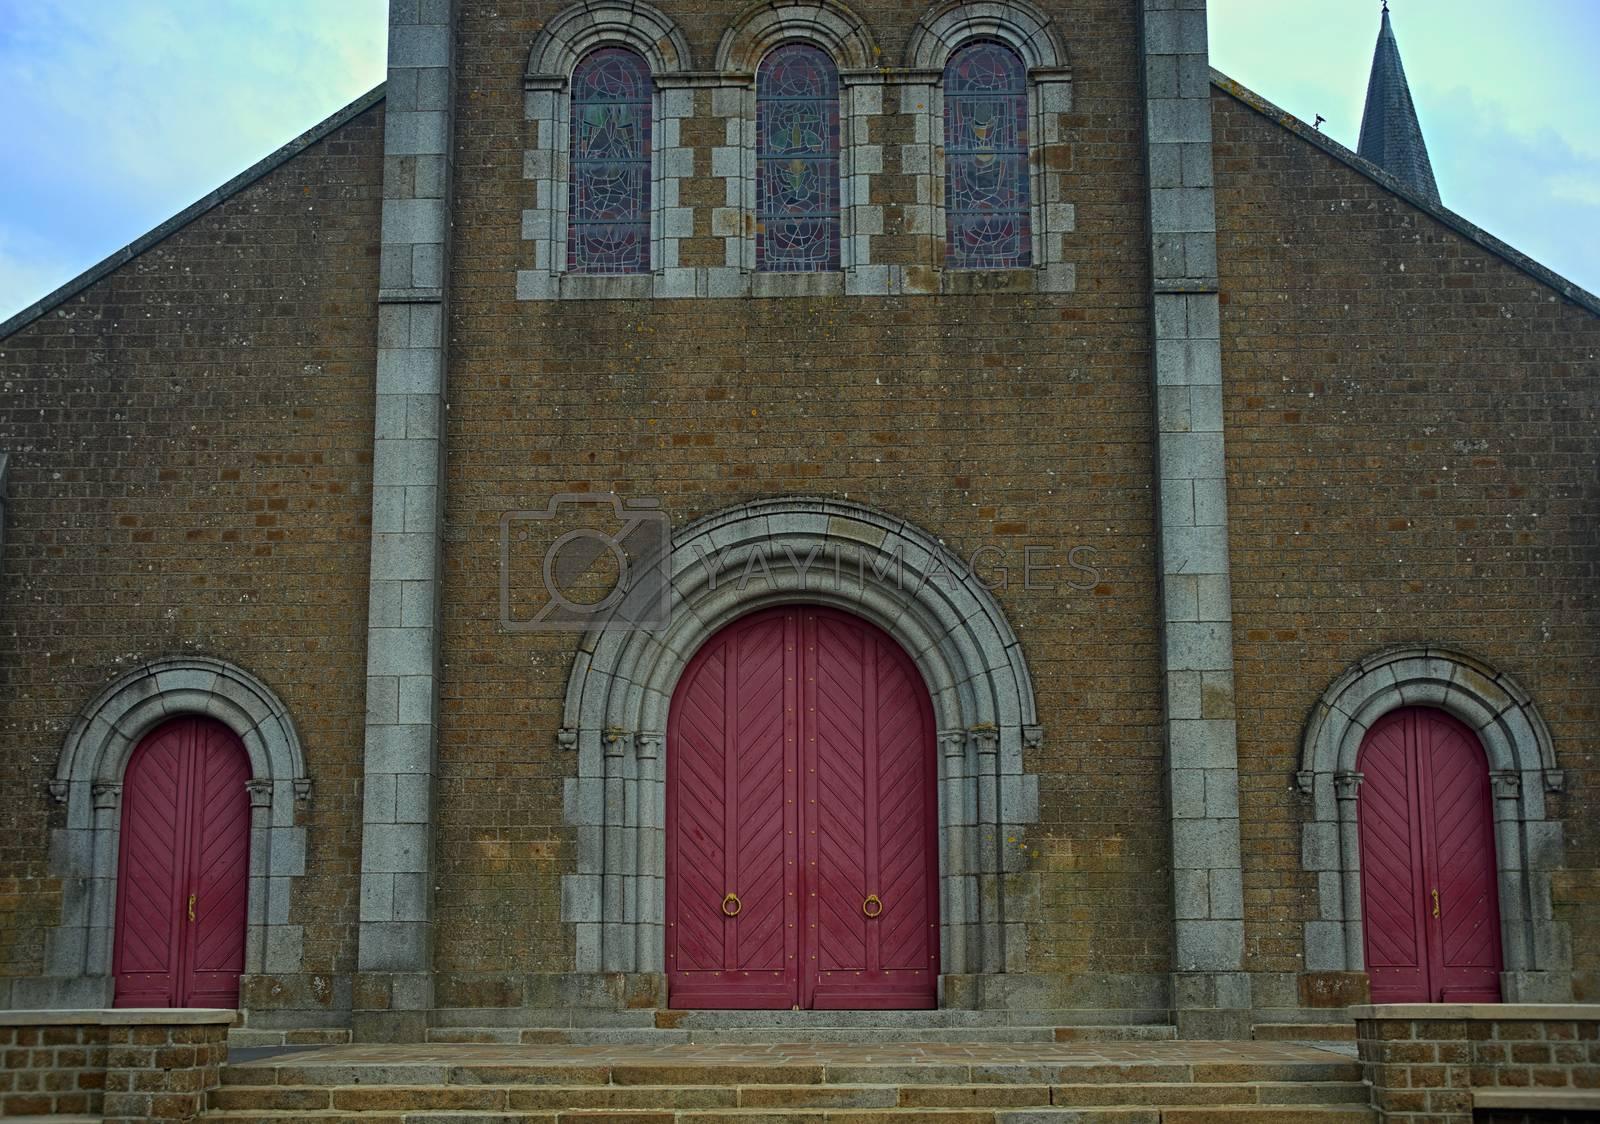 Royalty free image of Main front entrance at big old stone catholic cathedral by sheriffkule